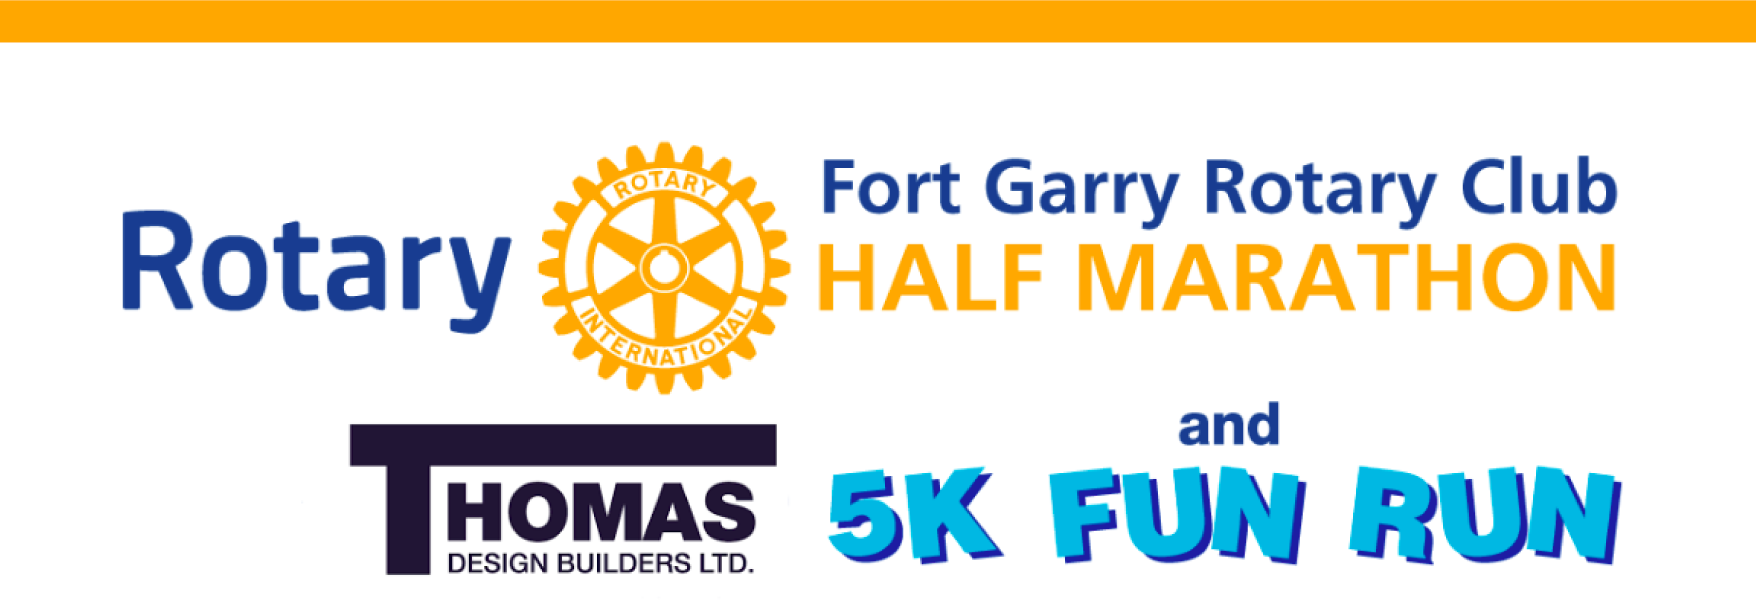 Fort Garry Rotary Half Marathon & 5K Fun Run